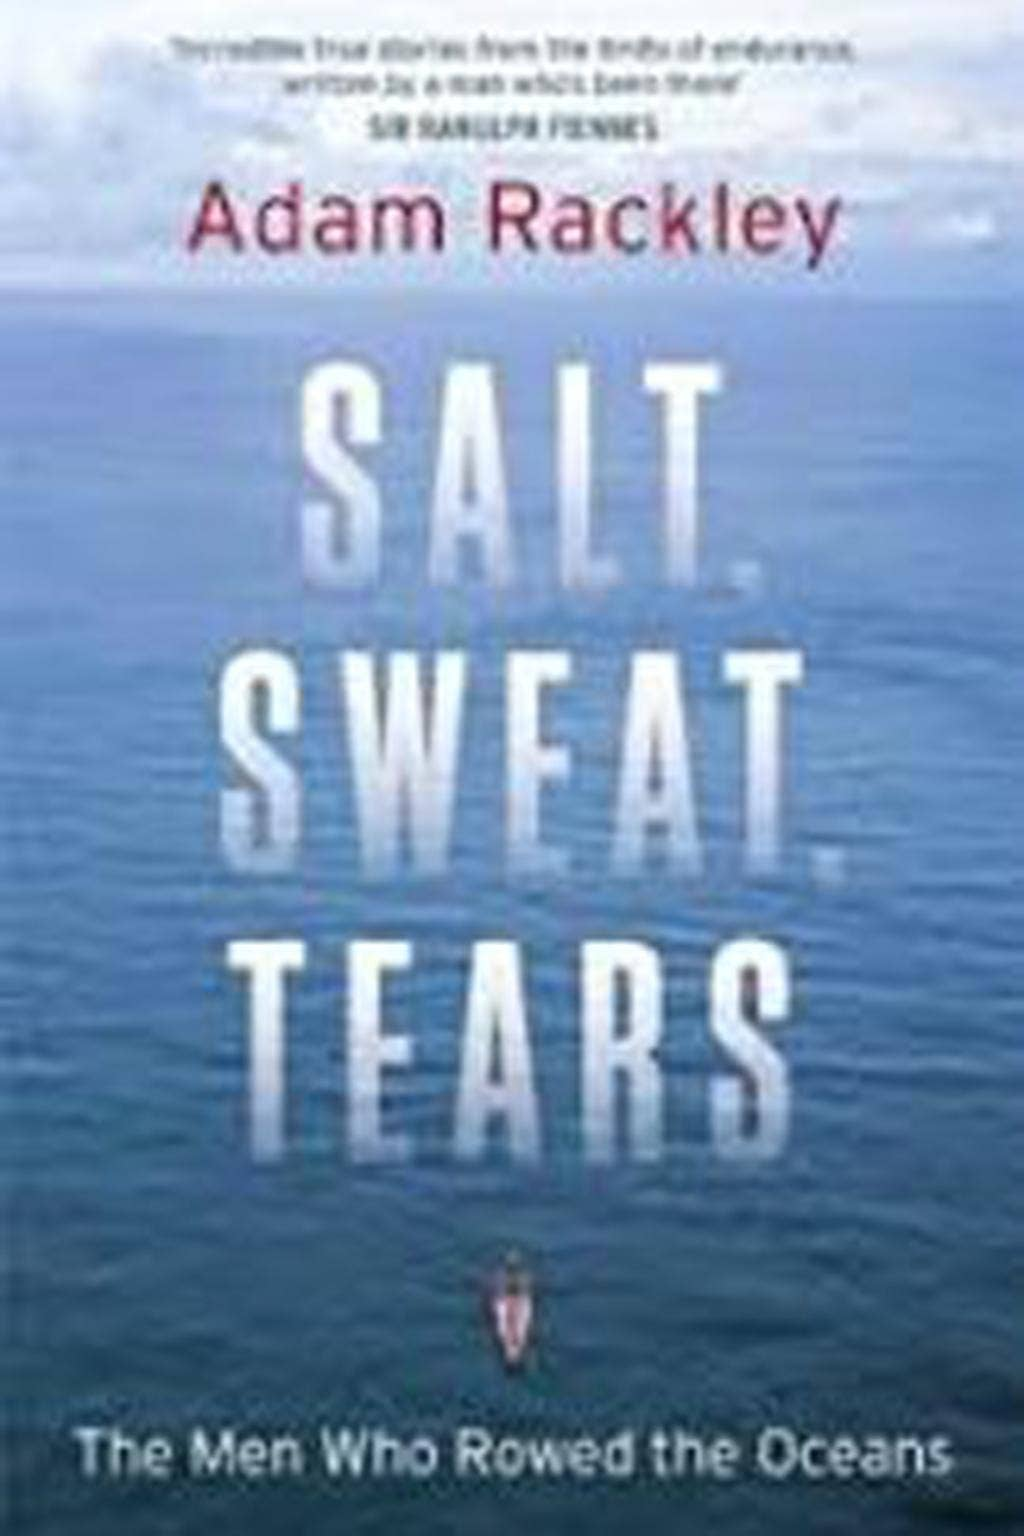 Salt, Sweat Tears - The Men Who Roed The Oceans by Adam Rackley